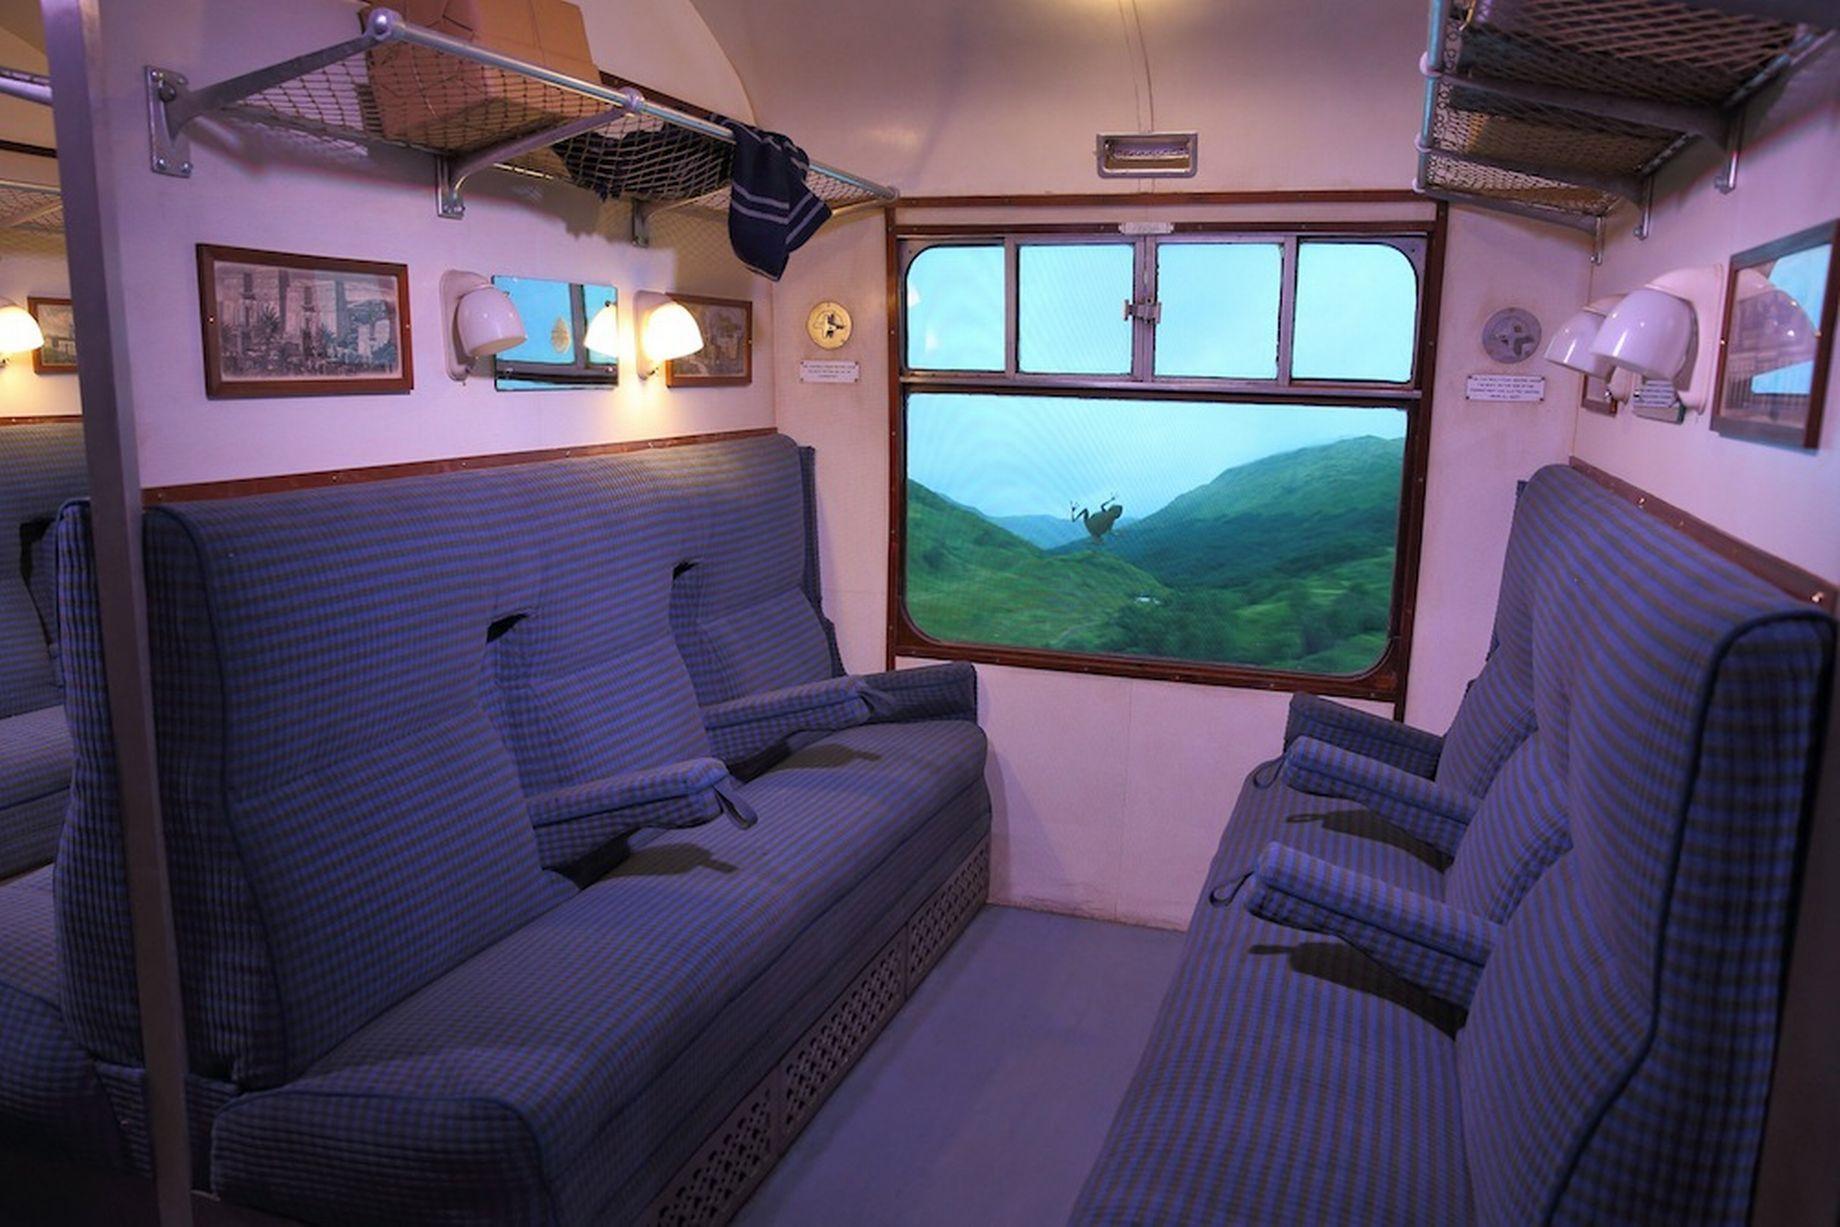 Harry Potter's Hogwarts Express and Platform 9¾ un